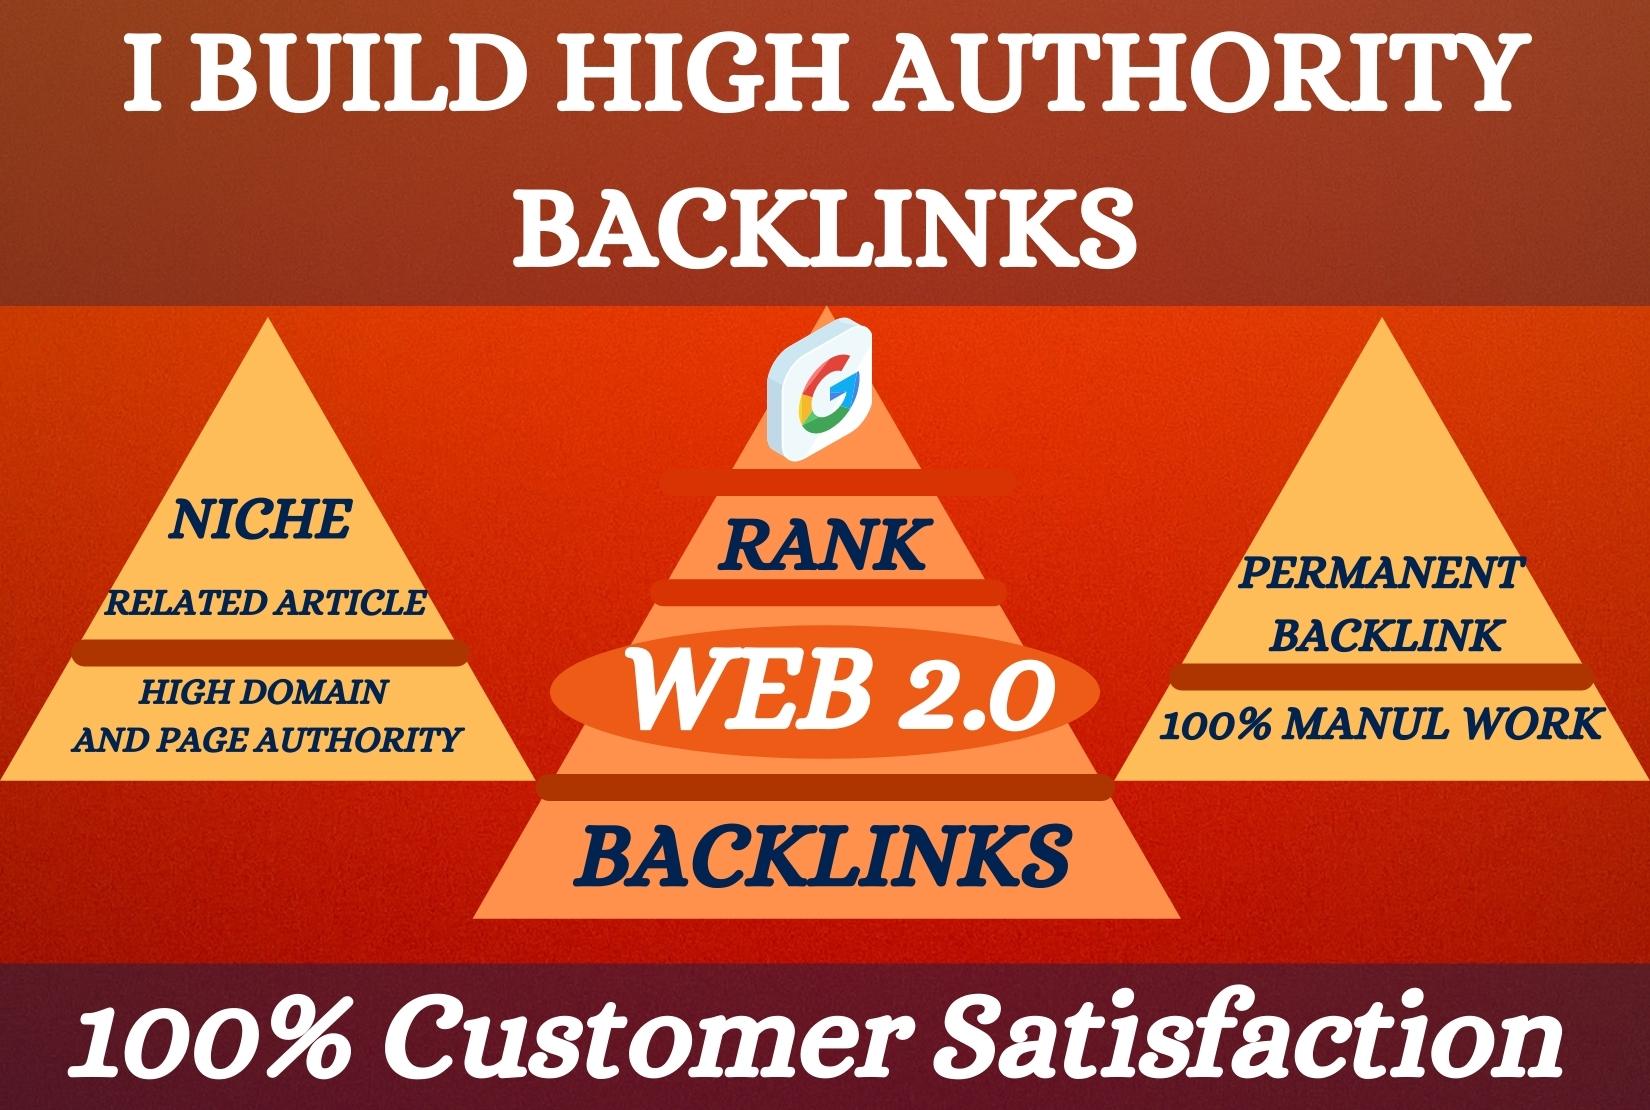 I will build web 2.0 backlinks